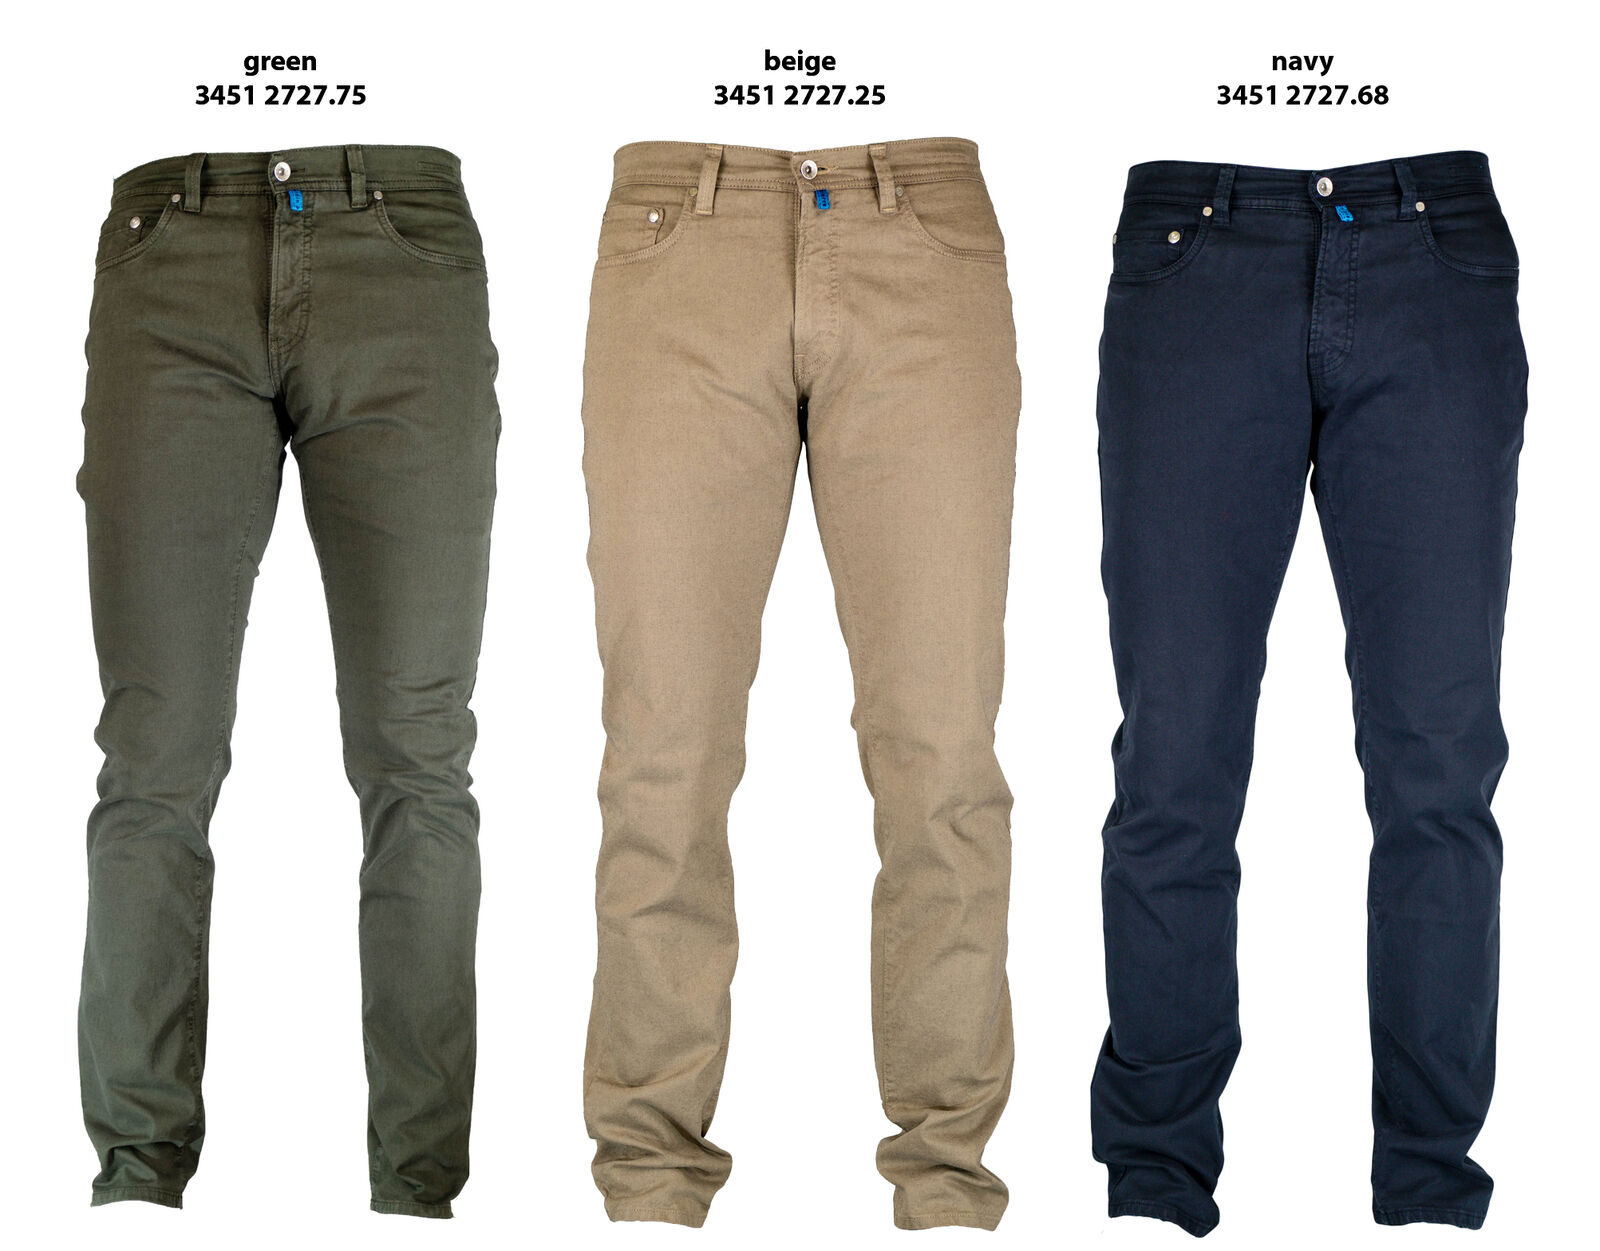 Pierre Cardin Futureflex Strech Chino Lyon Pantalones Para Hombre Creeo Com Br